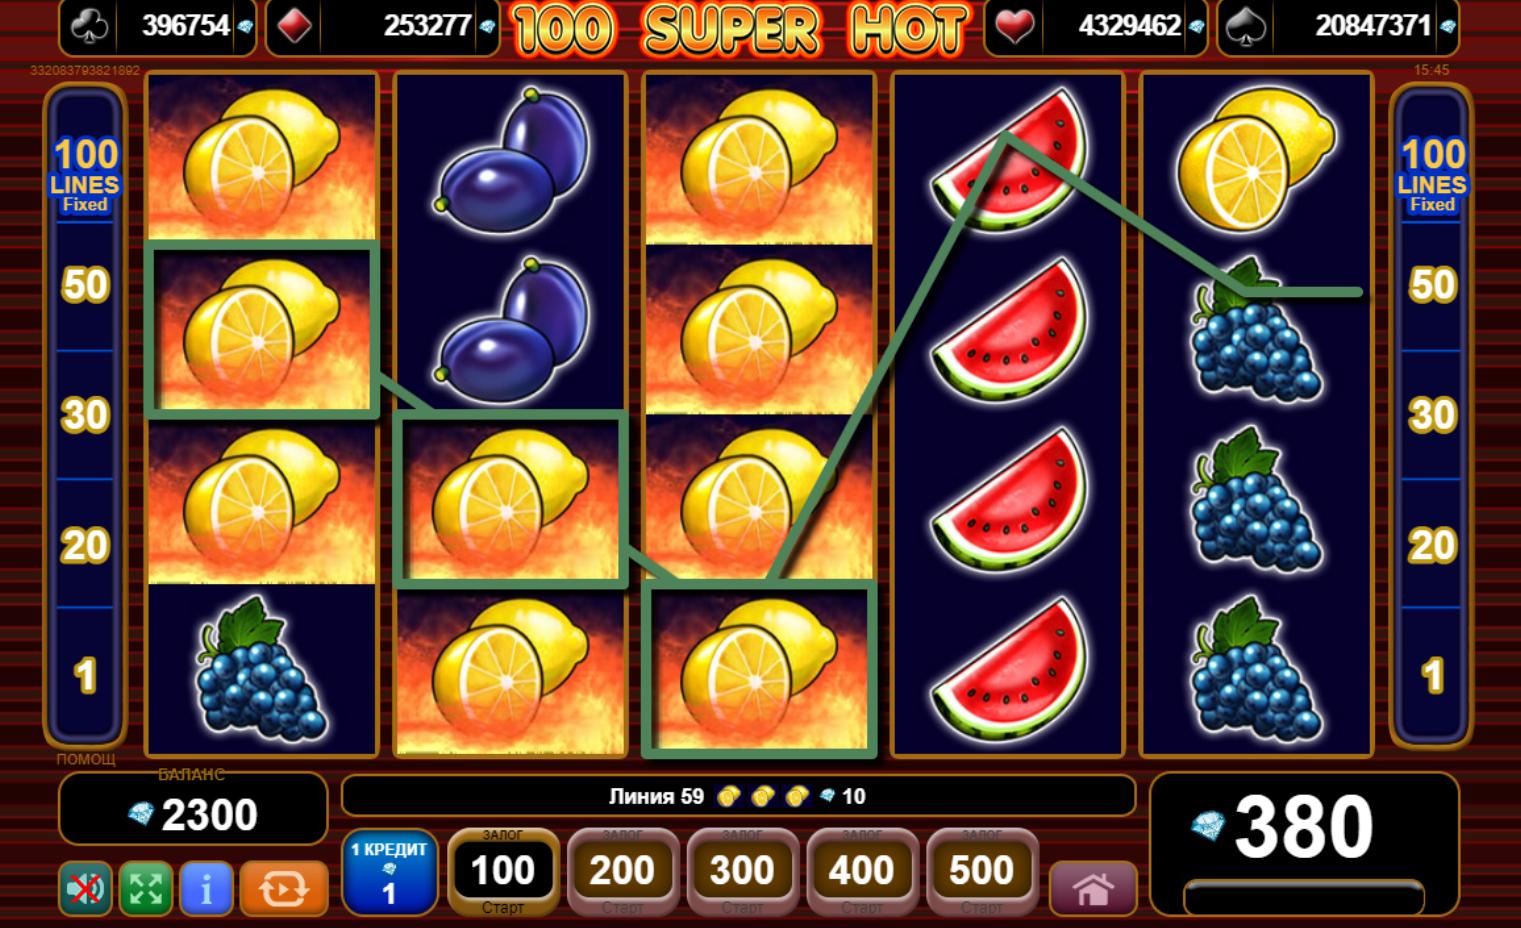 100 super hot-komarbet.com